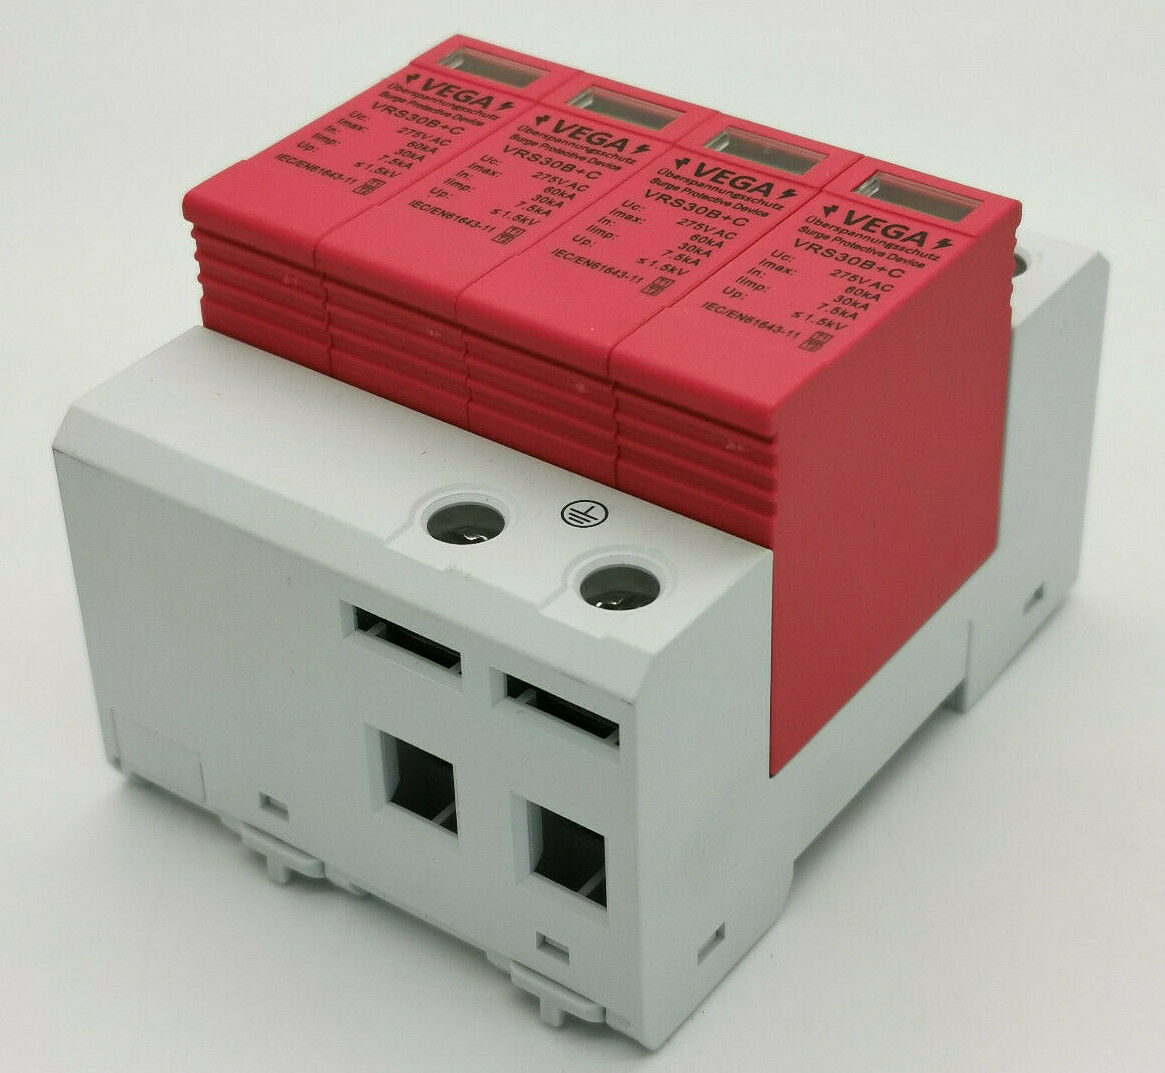 Blitz- Überspannungsschutz, Kombiableiter AC 4-polig, Imax 60 kA Imp 7,5kA, T1 T2